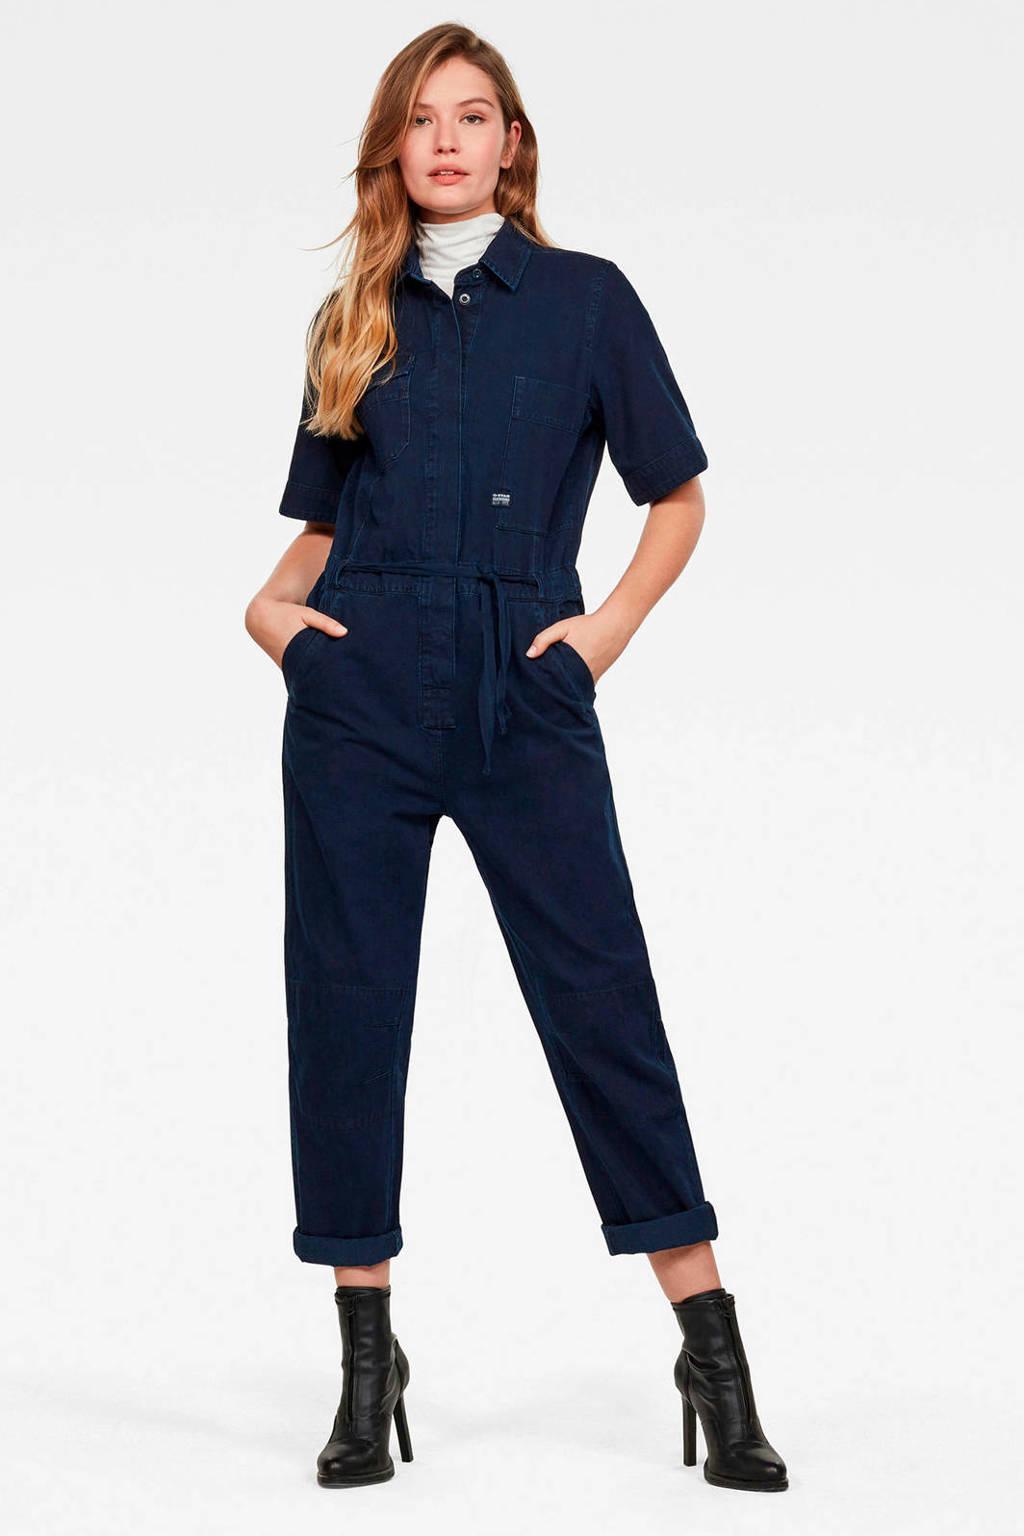 G-Star RAW jumpsuit sartho blue, SARTHO BLUE